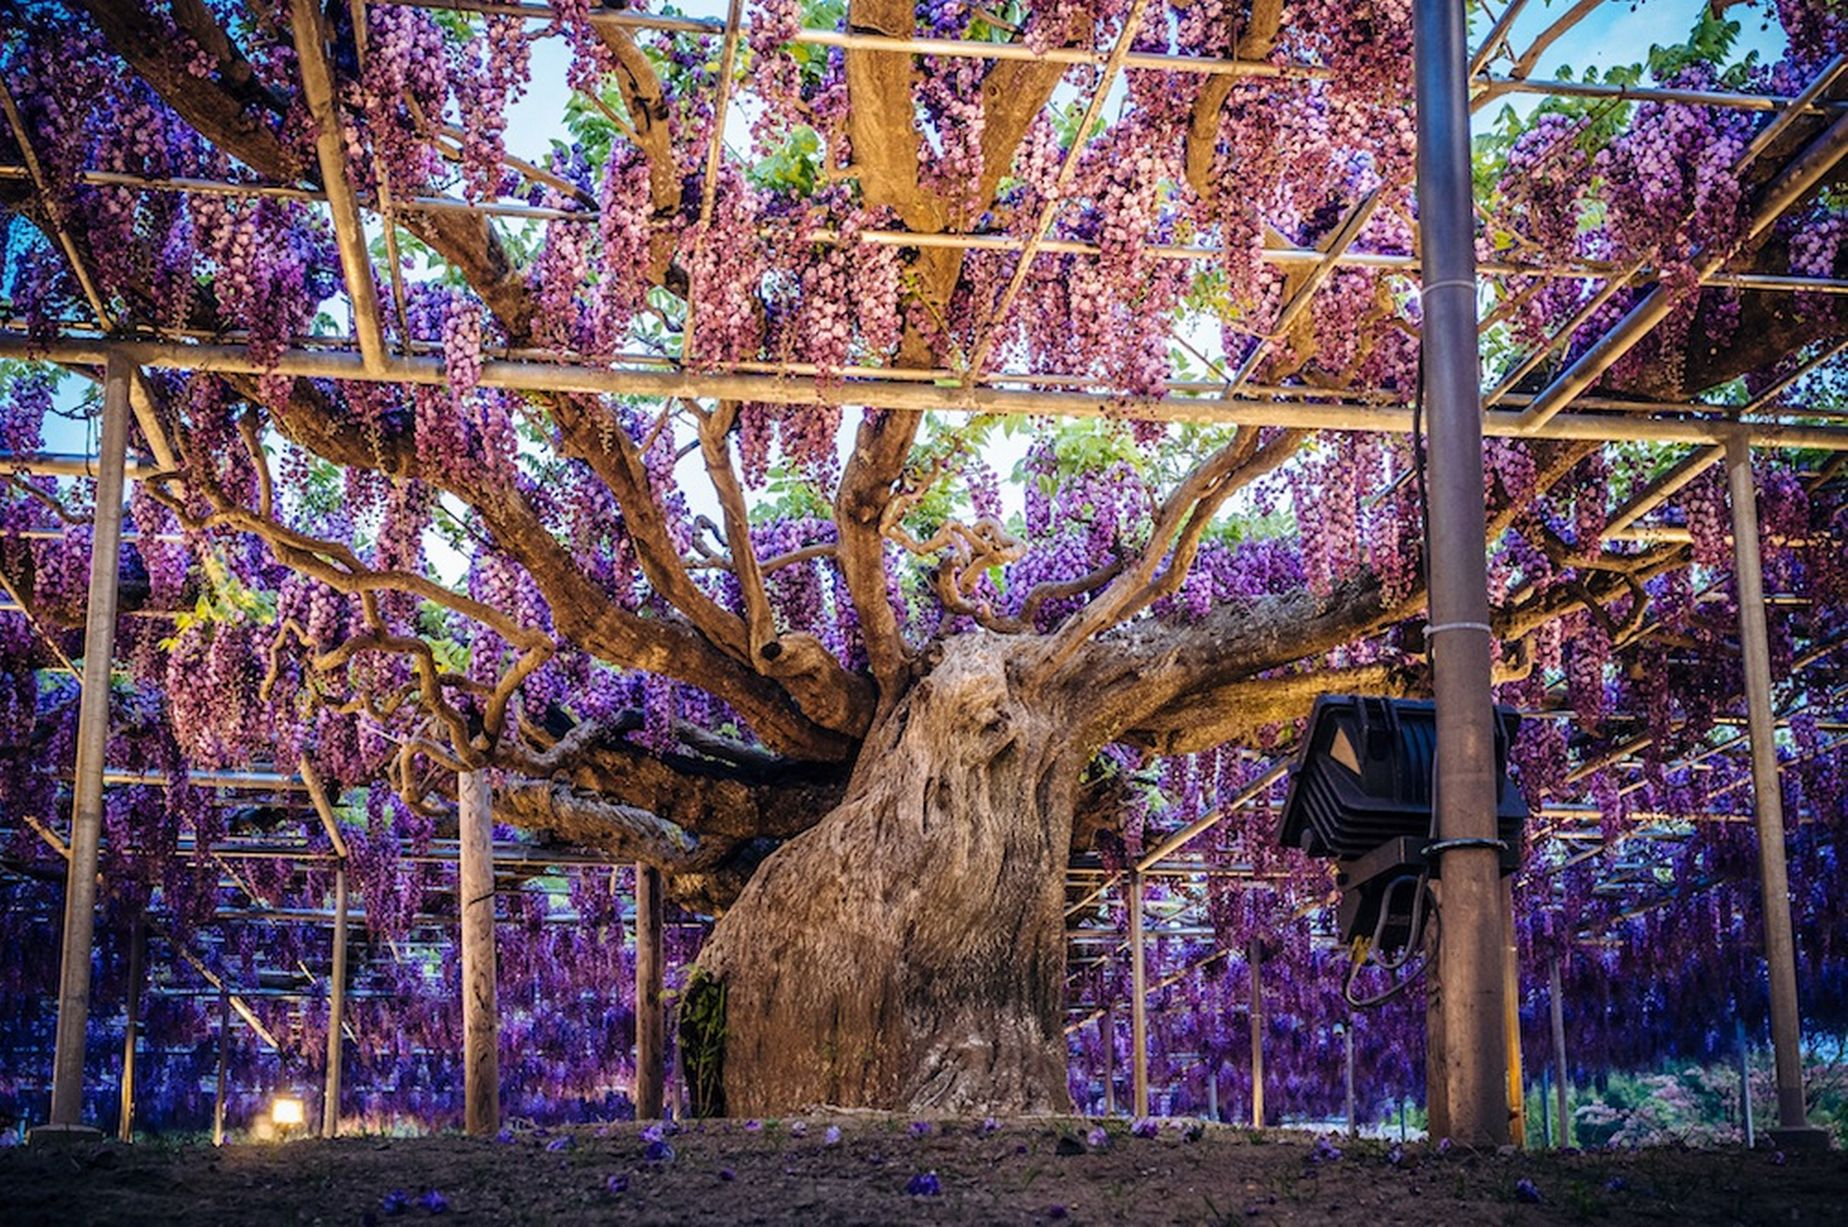 Indahnya Bunga Wisteria di Taman Bunga Ashikaga image